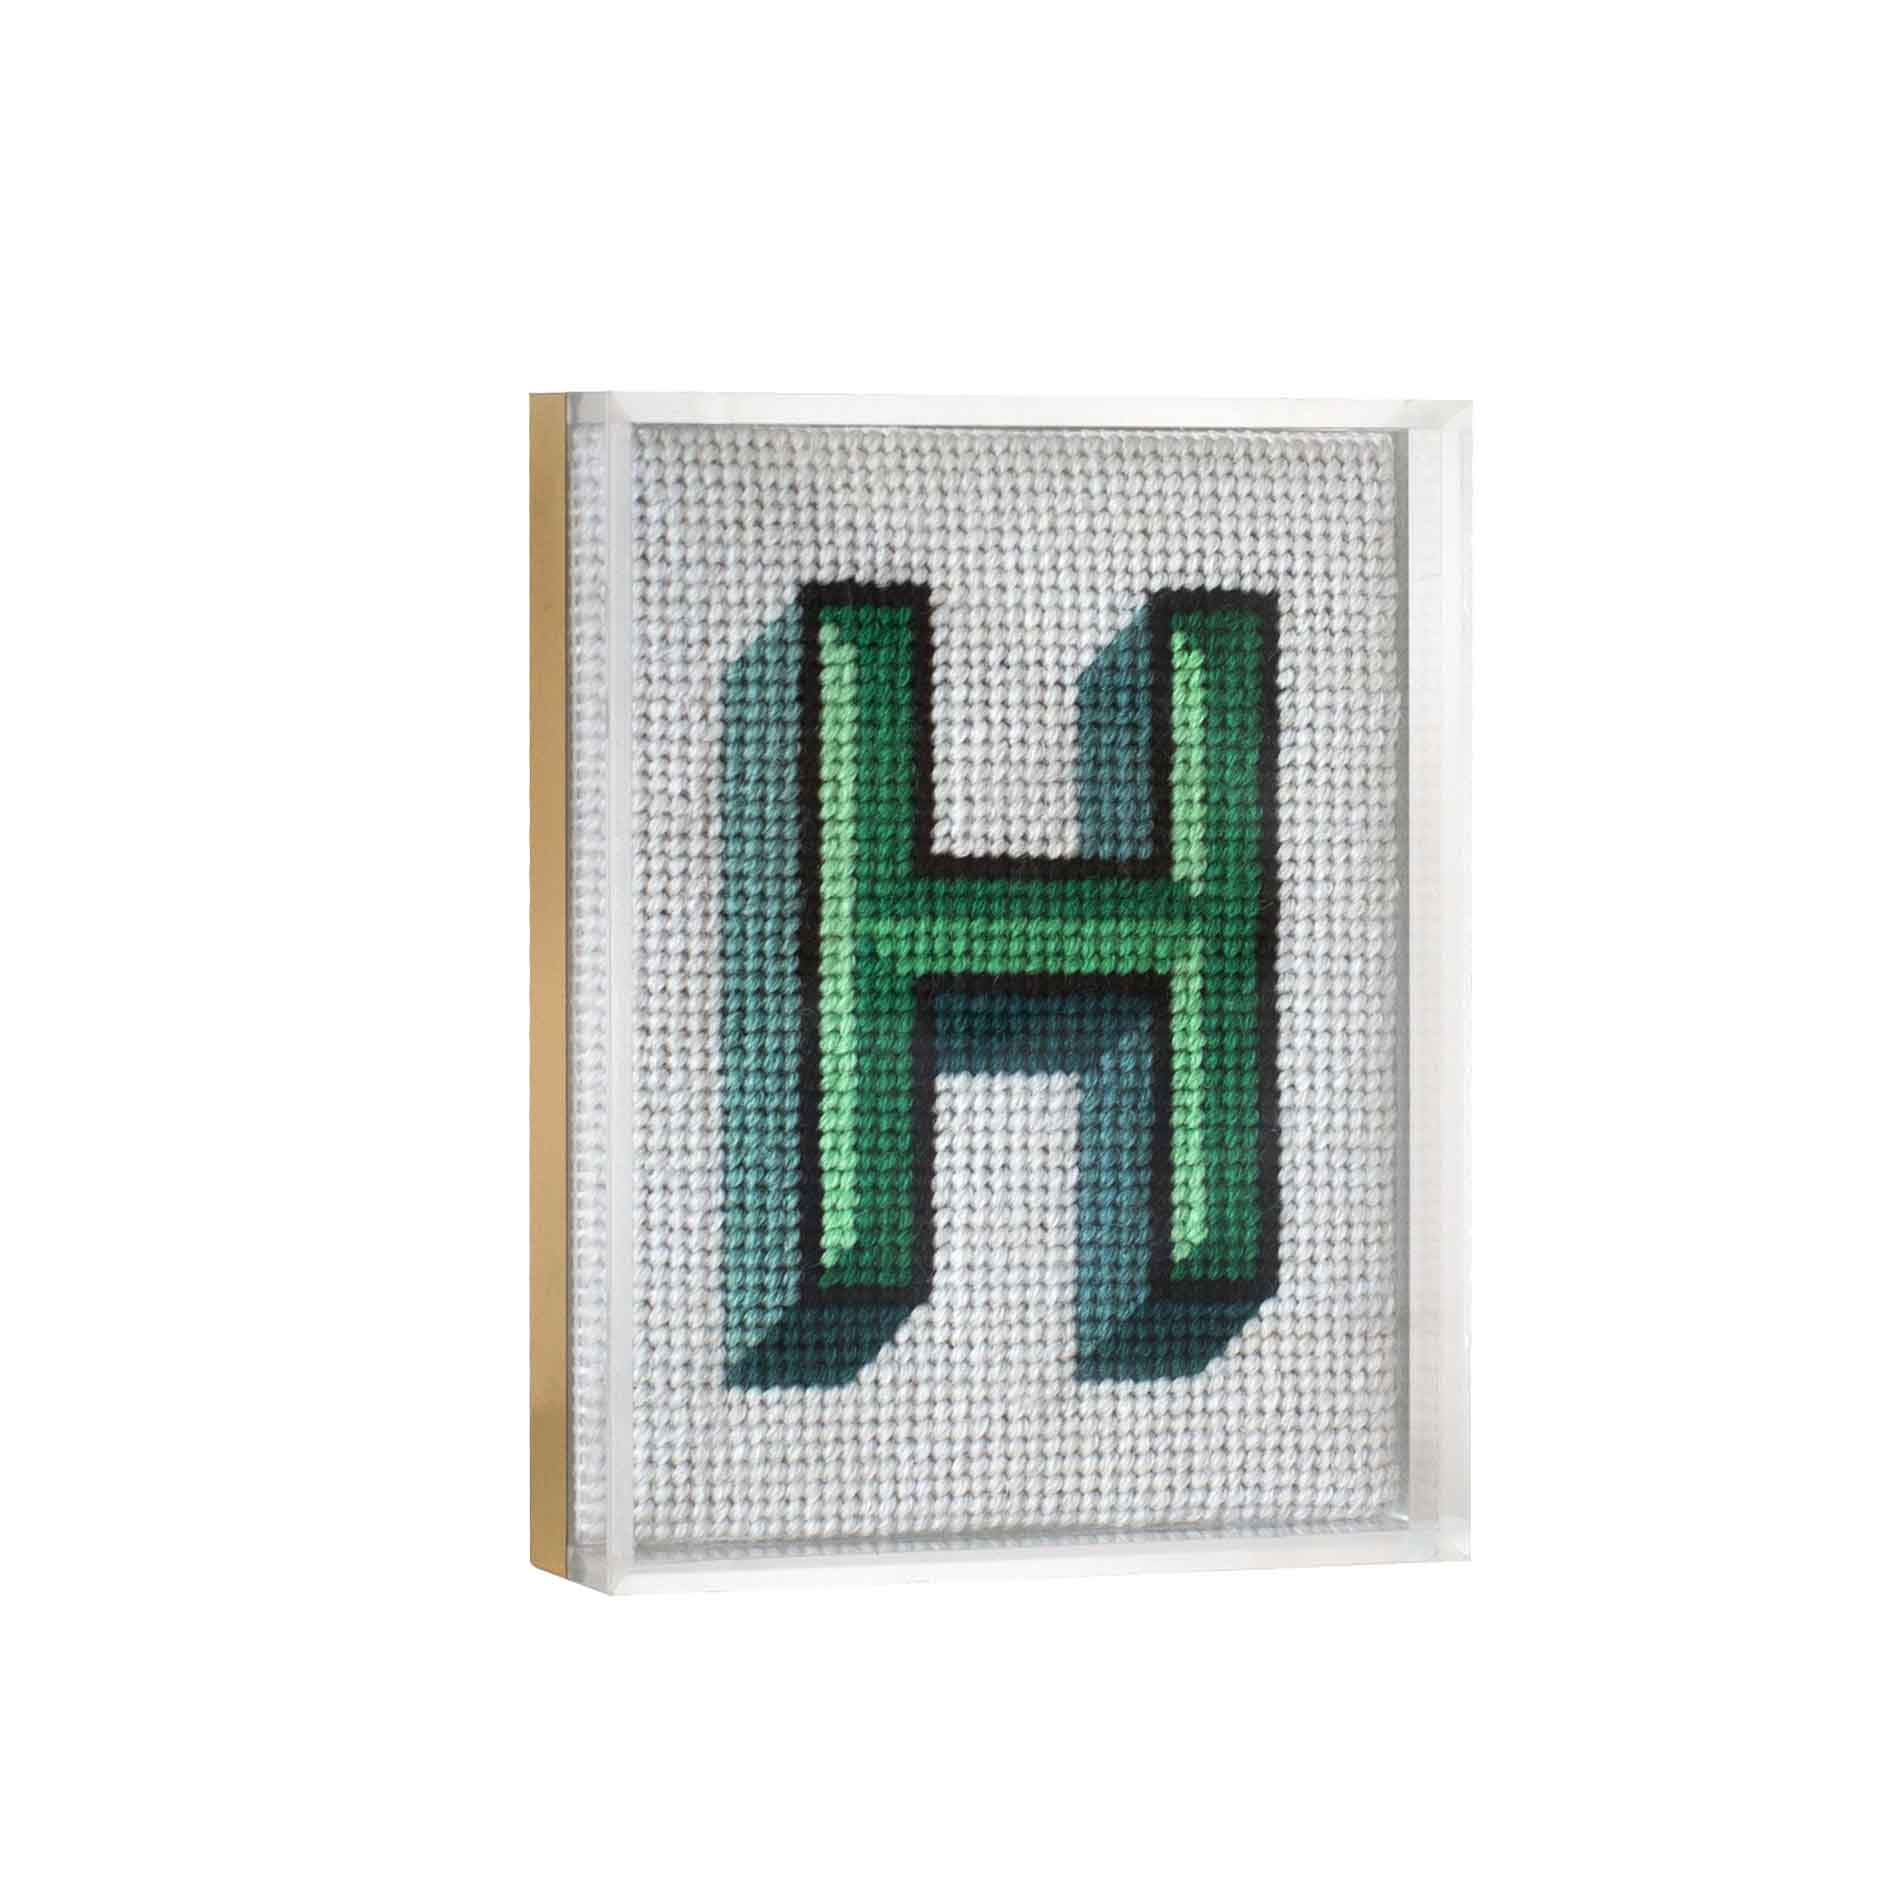 Hunt-And-Hope-Bespoke-Handstitched-needlepoint